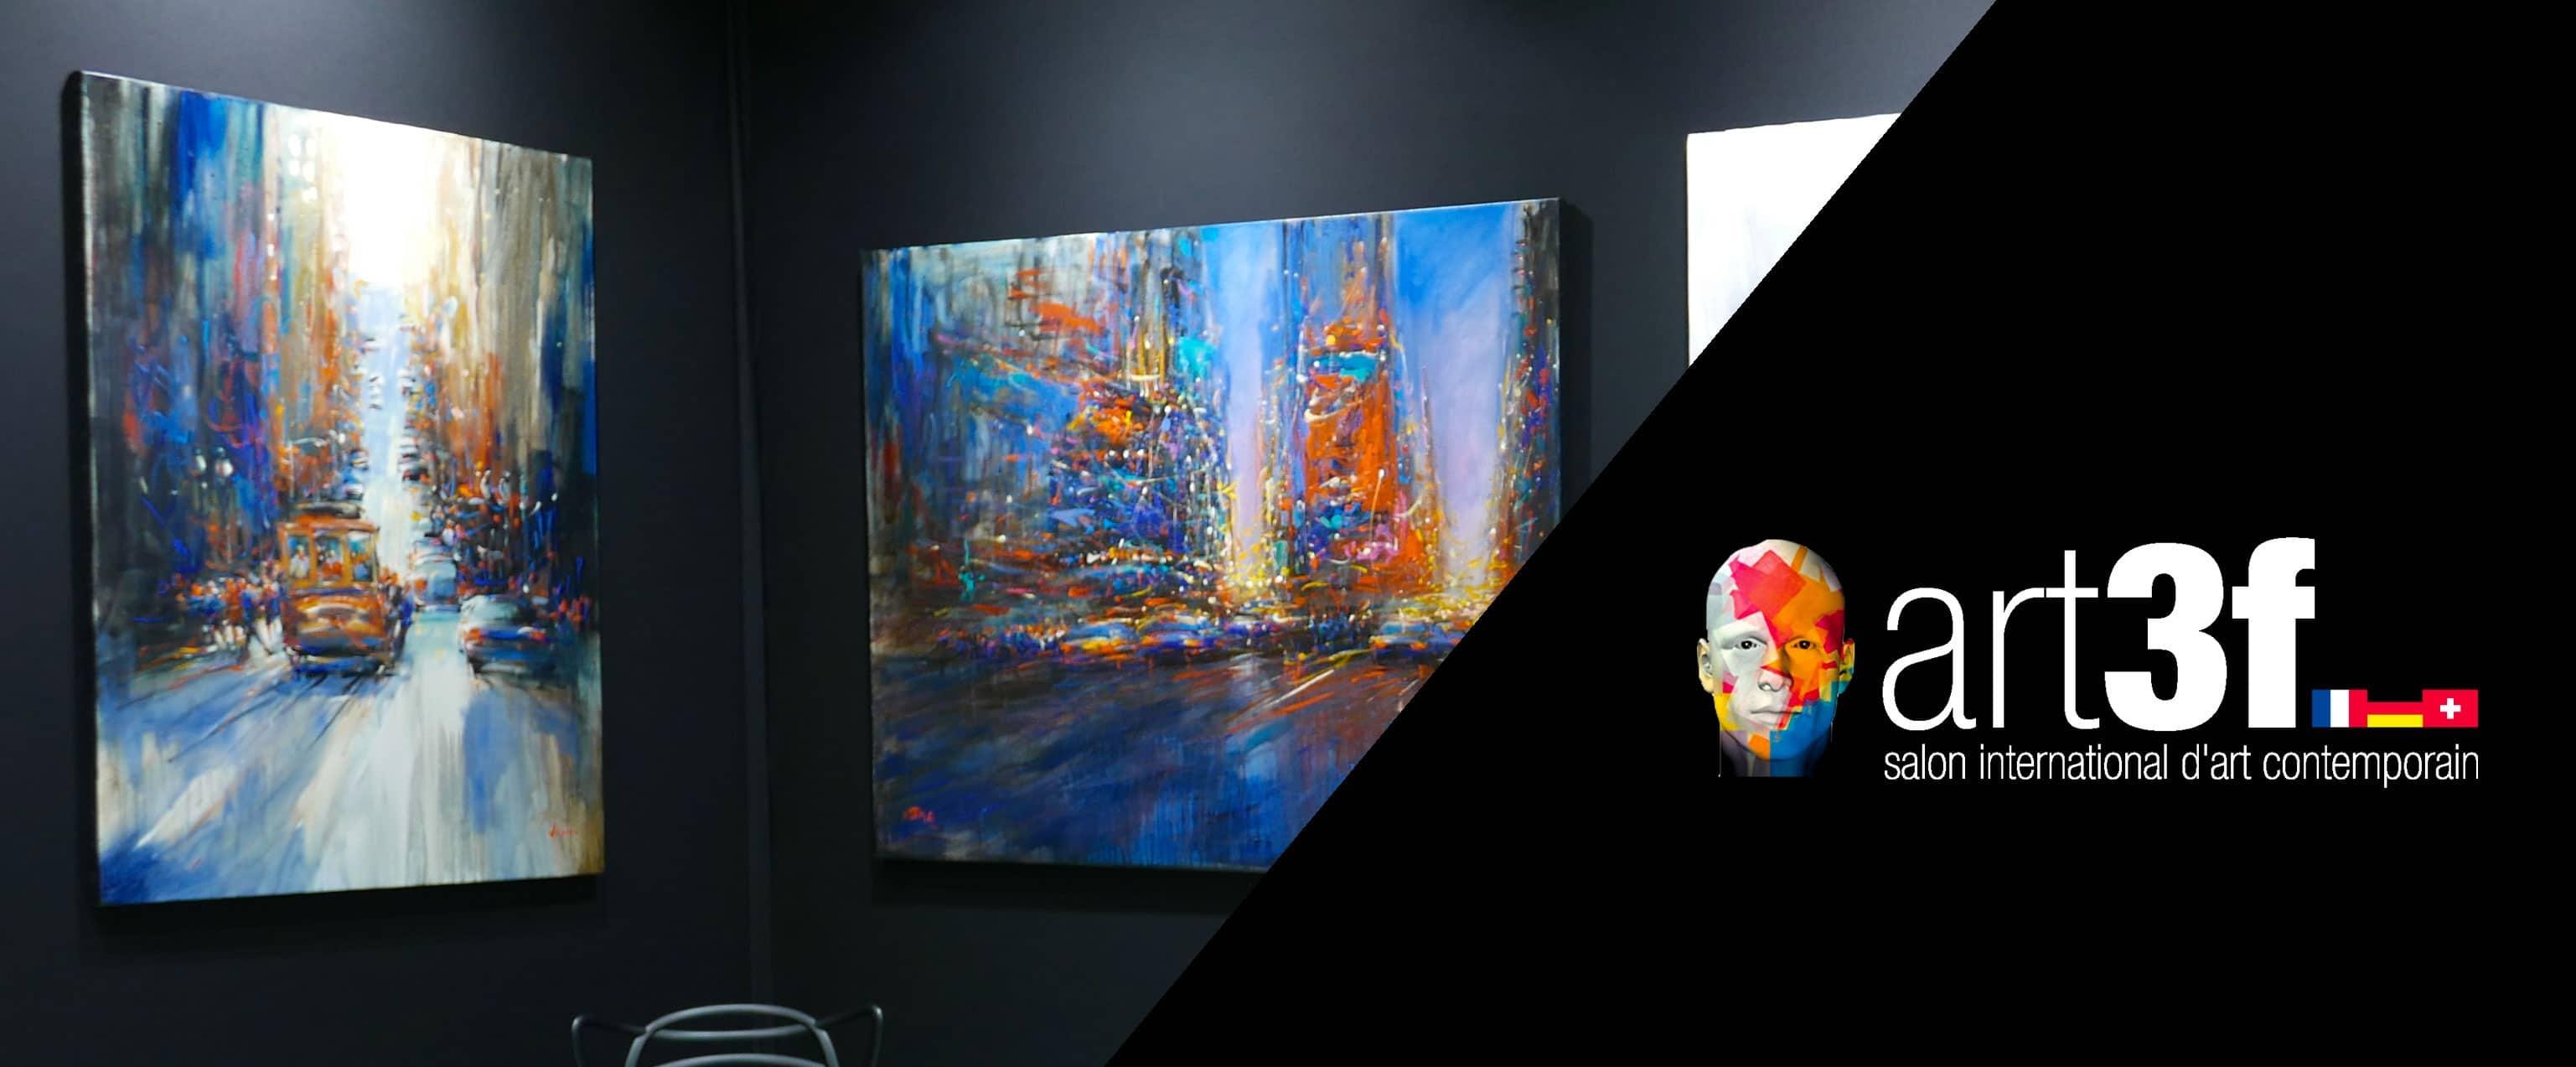 Art3f foire d'art 2020